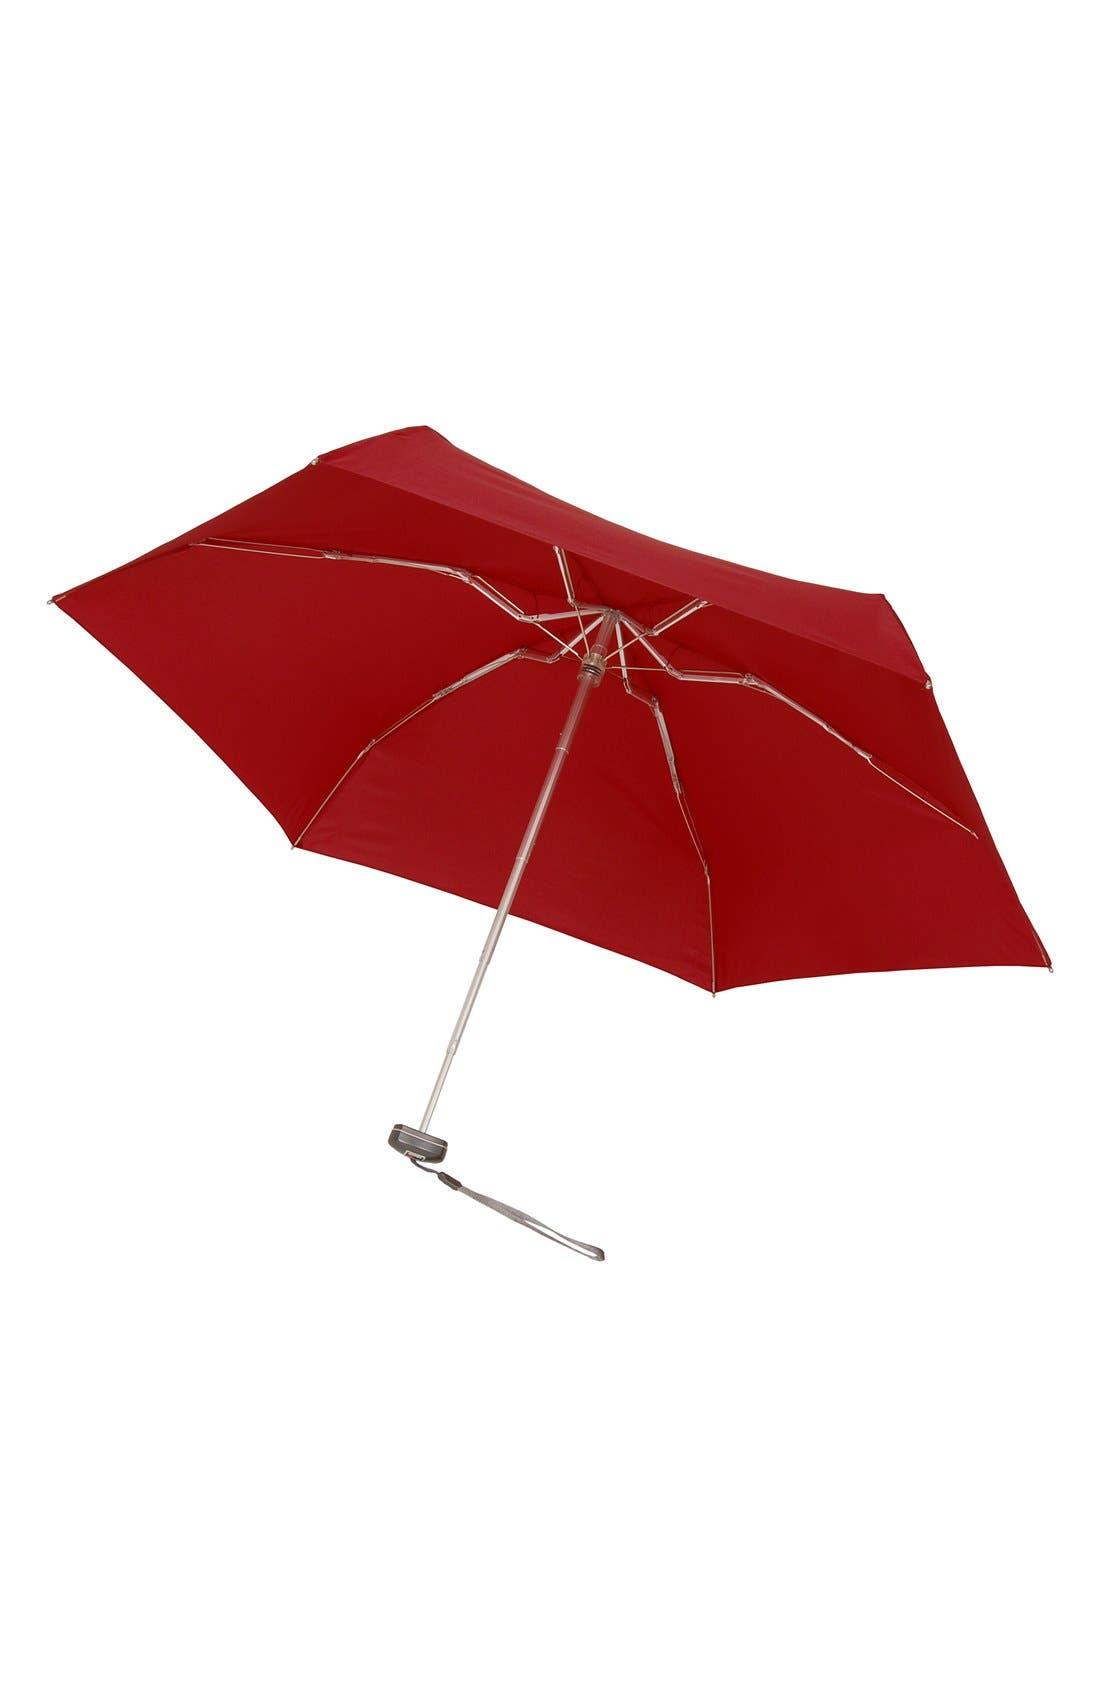 Knirps Travel Umbrella